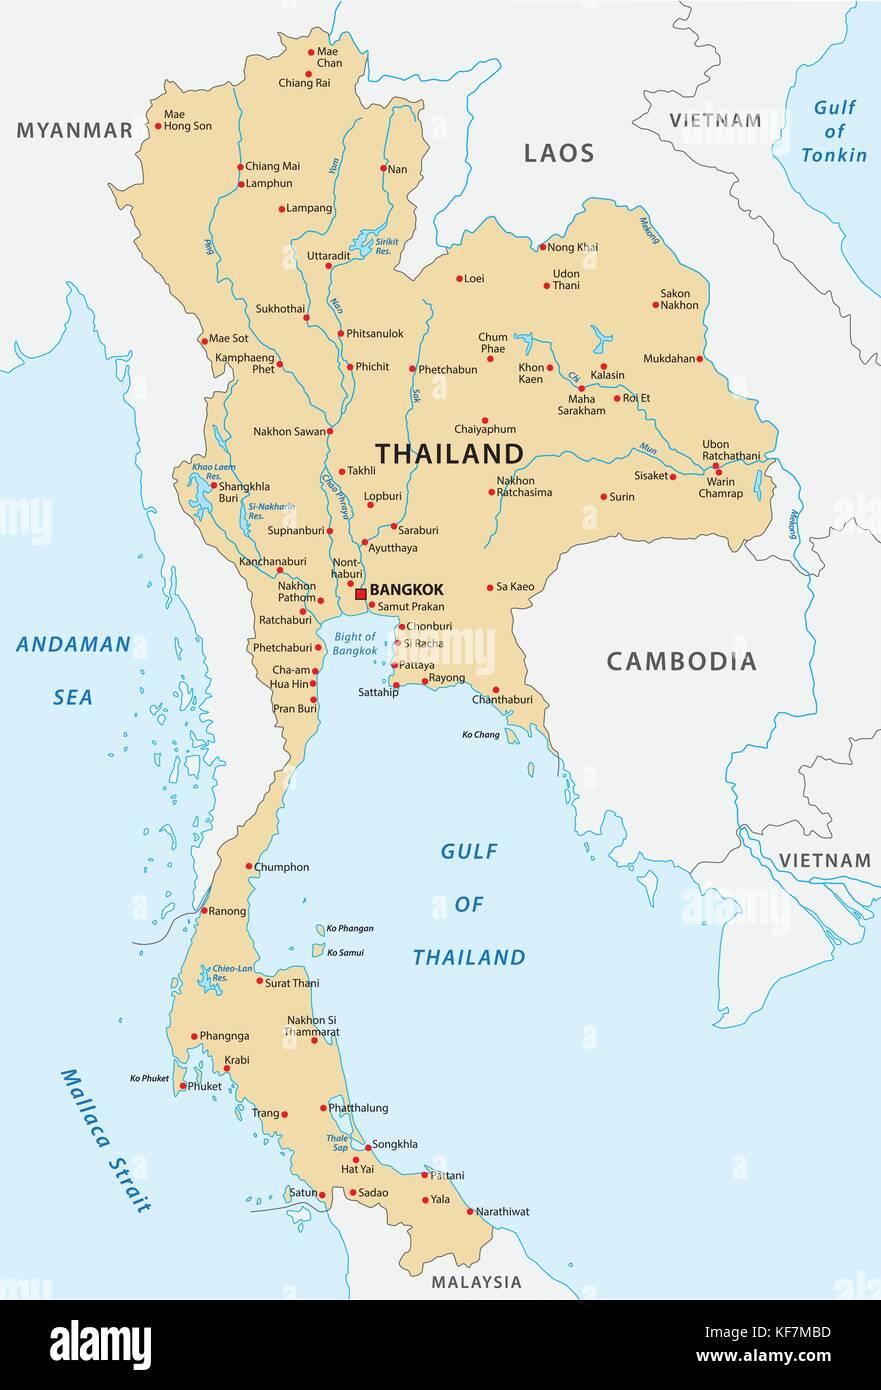 Map Of Cambodia Vietnam Thailand Laos Stock Photos Map Of - Laos map vector